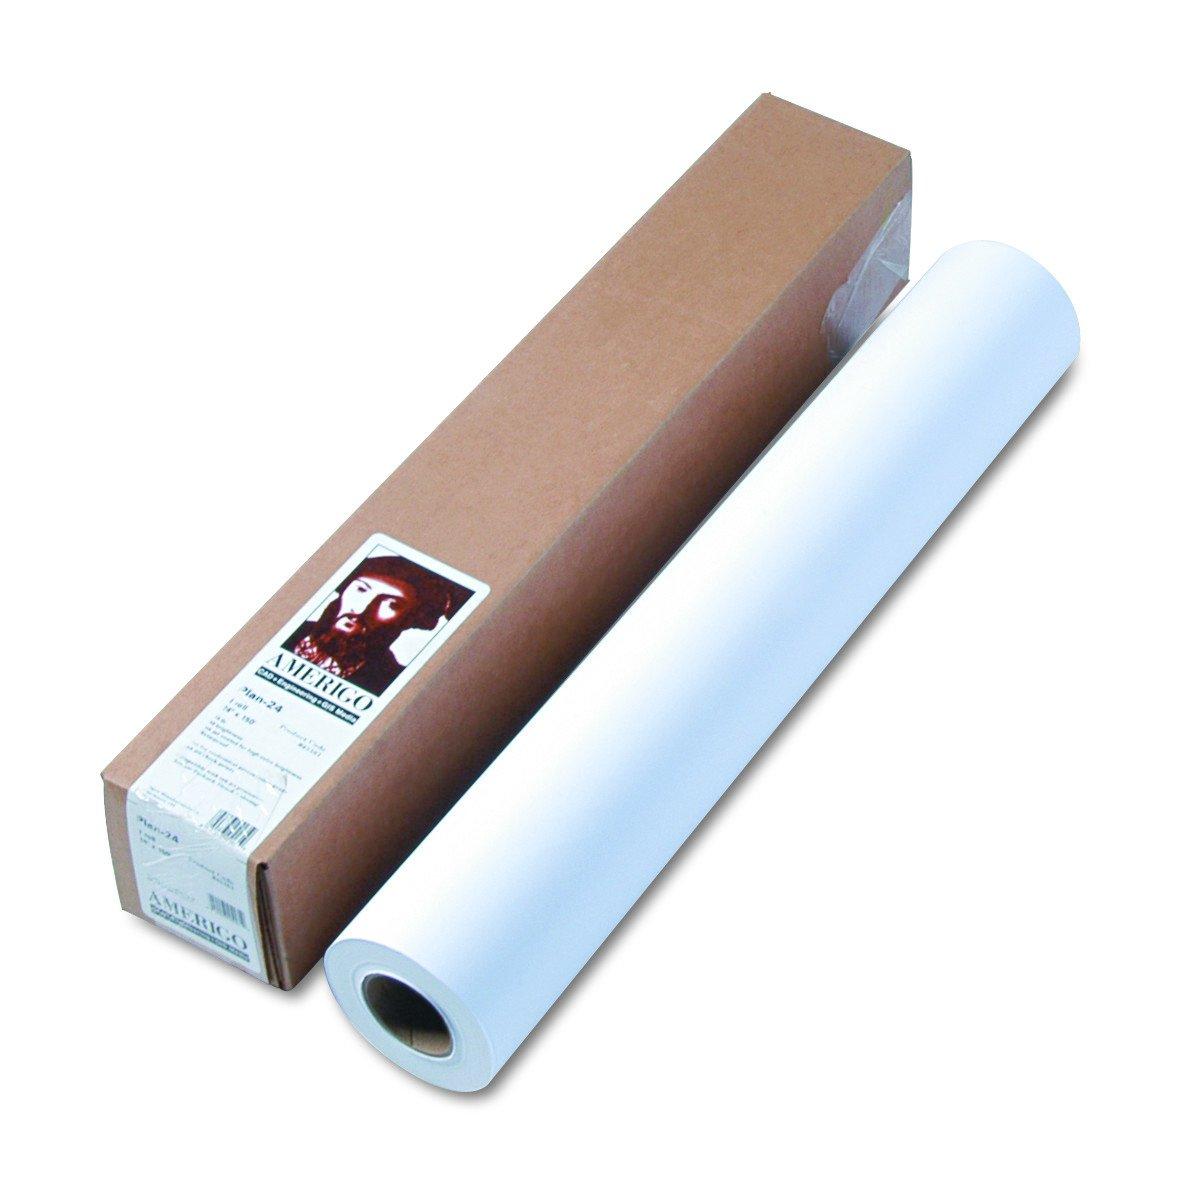 24in X 150ft A1d Special Inkjet Paper for Designjet Clr Plotters HEWLETT PACKARD 370727 Office Supplies